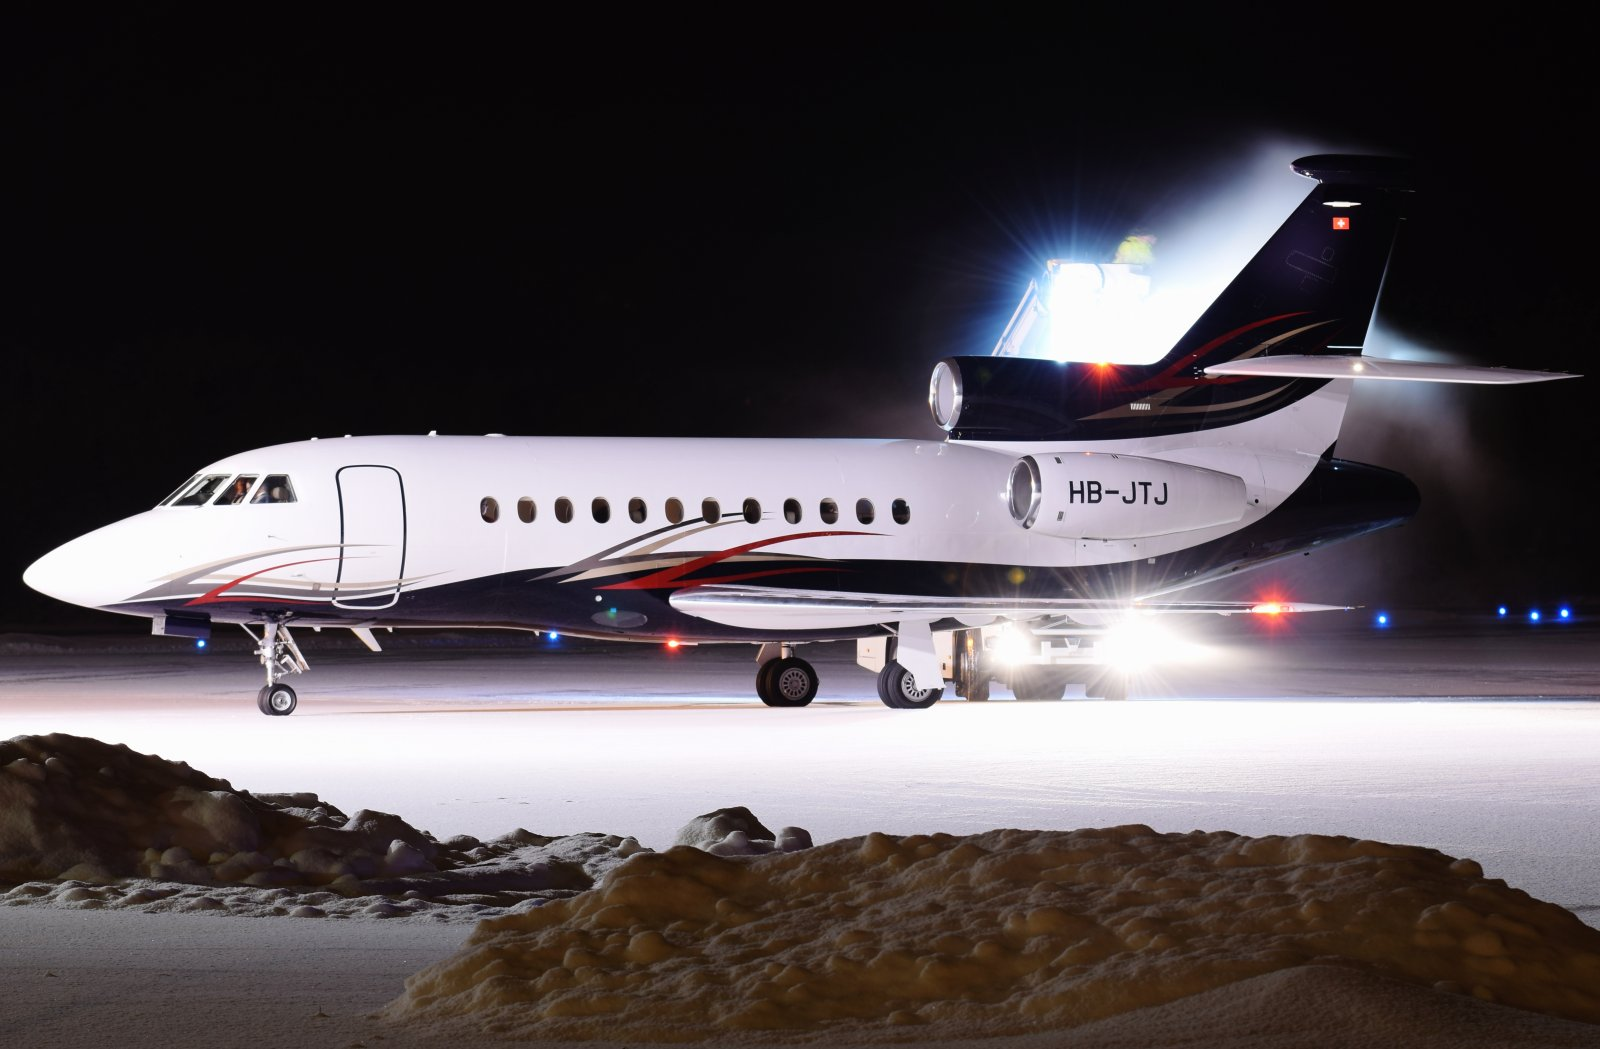 HB-JTJ - Dassault Falcon 900EX - 22.1.2019